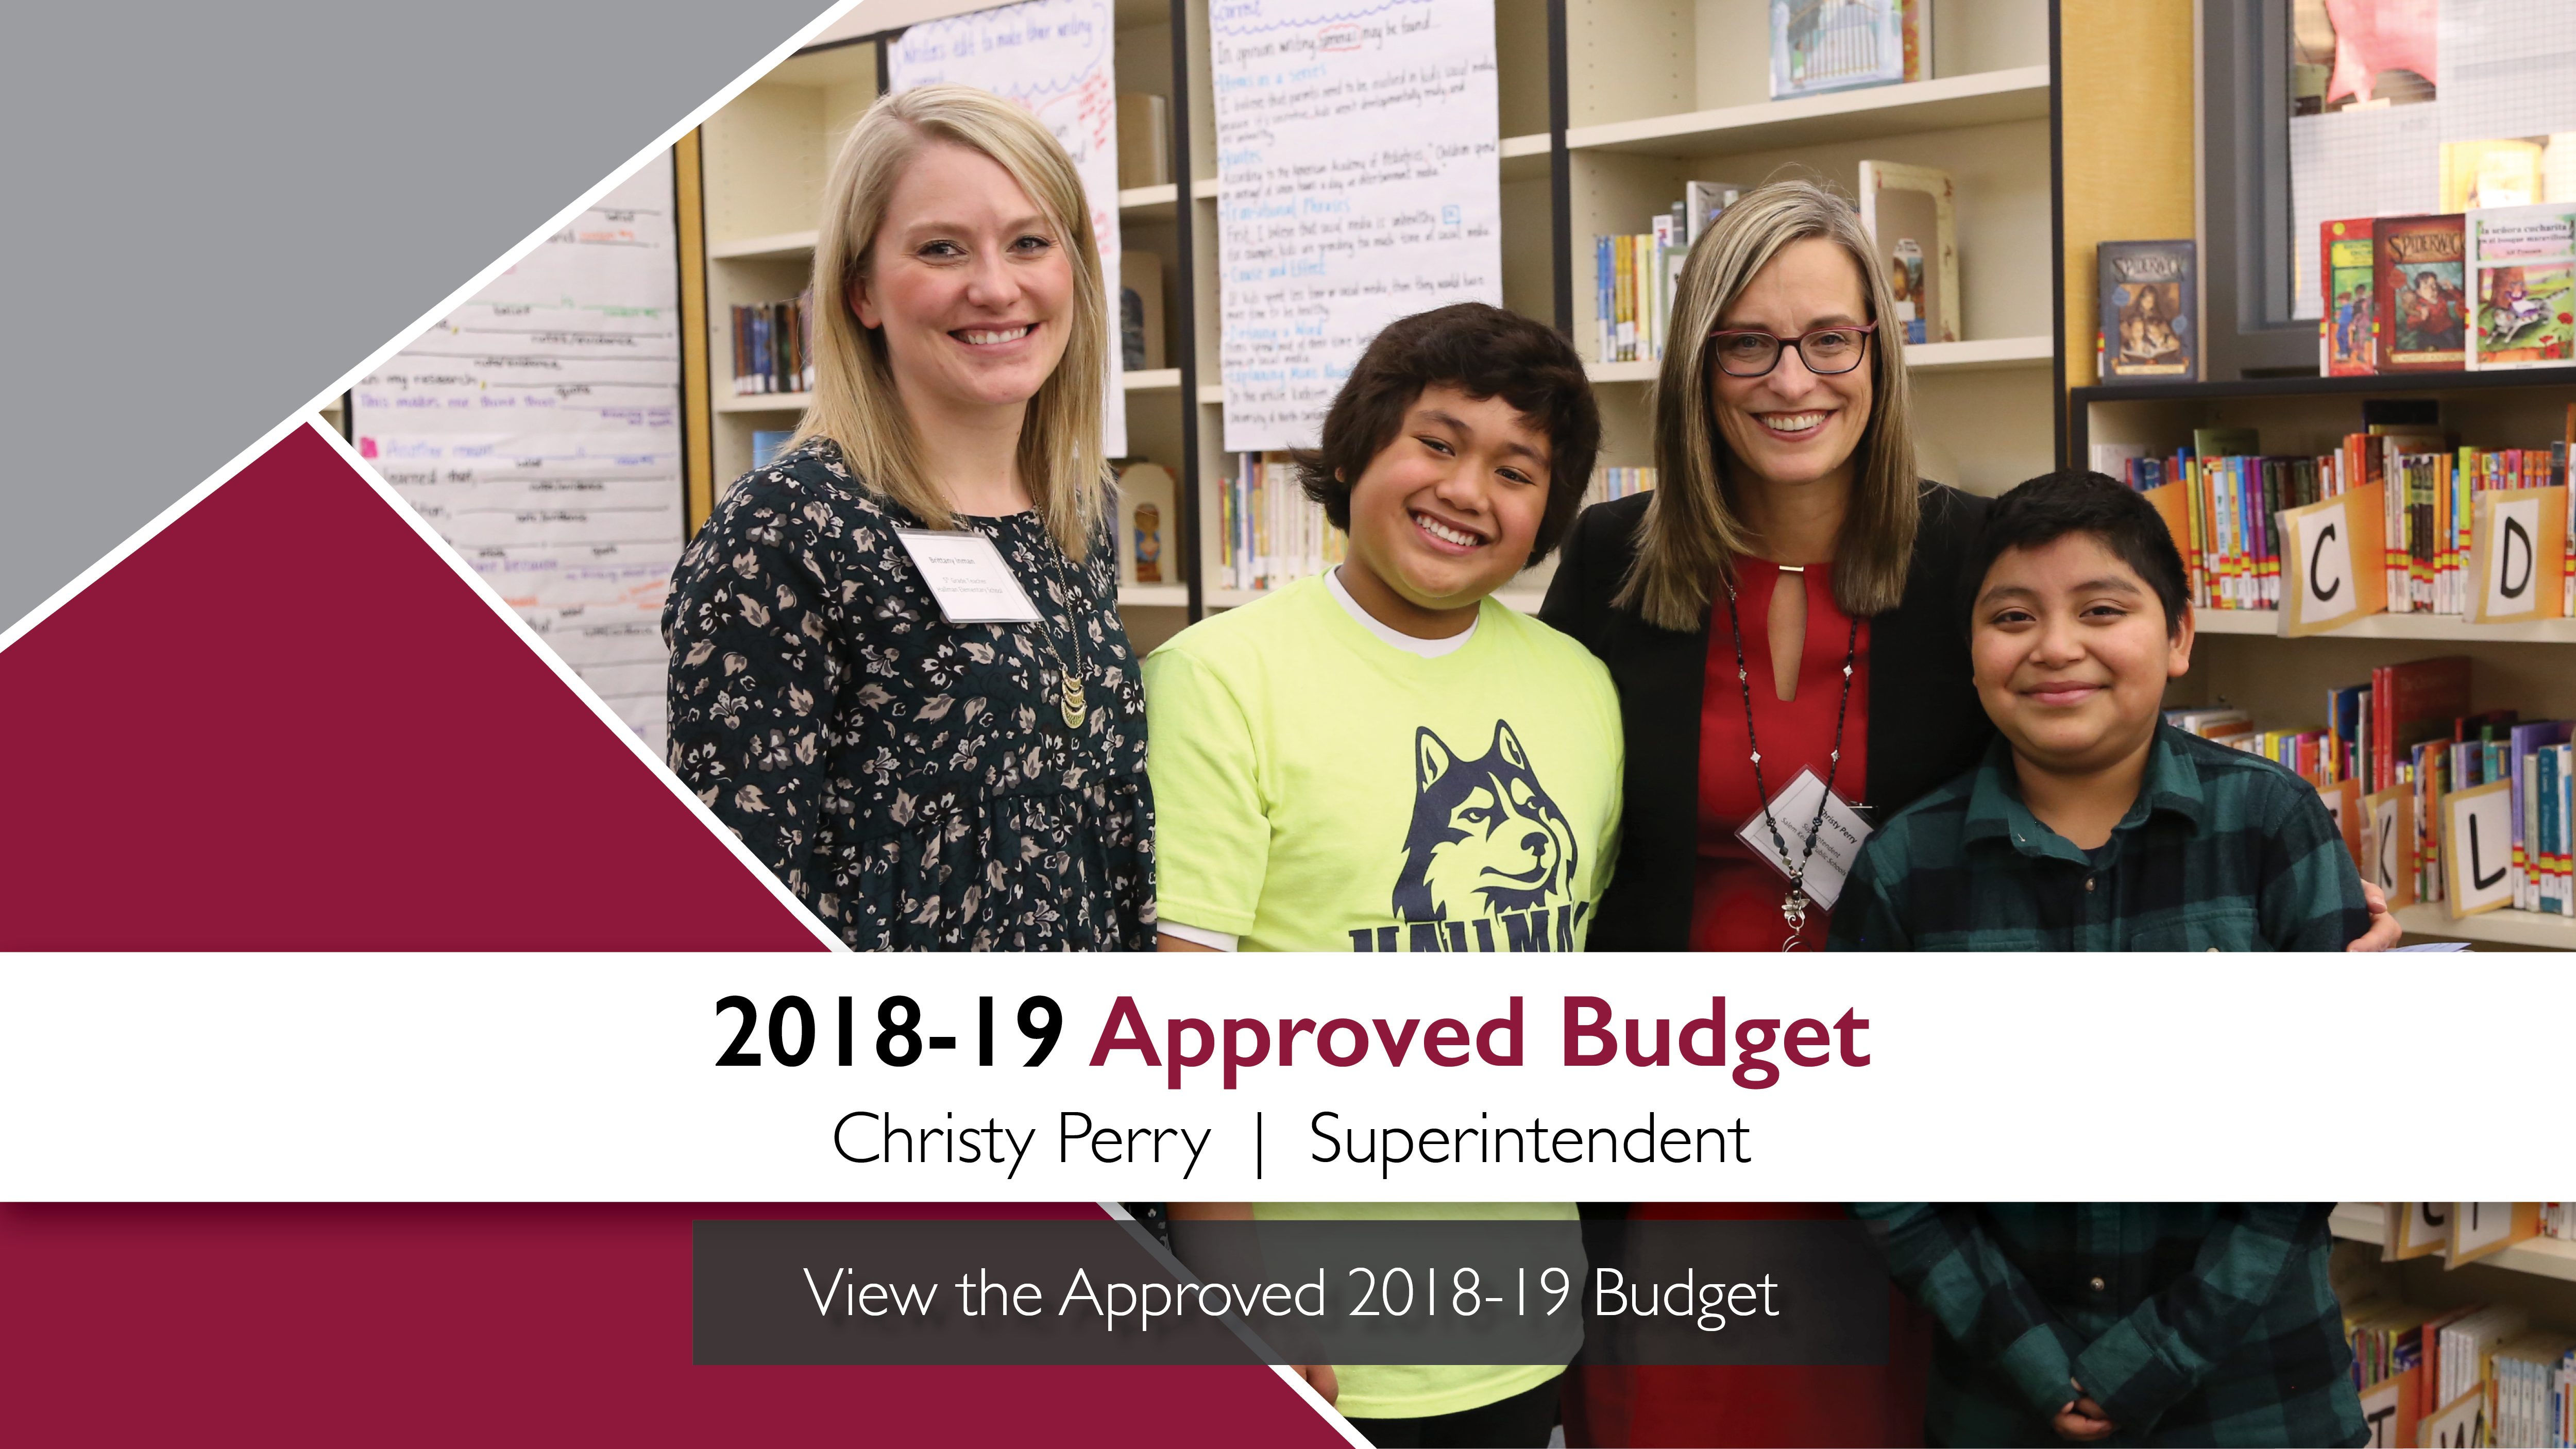 Salem-Keizer Budget Committee Approves $1.1 Billion 2018-19 Budget